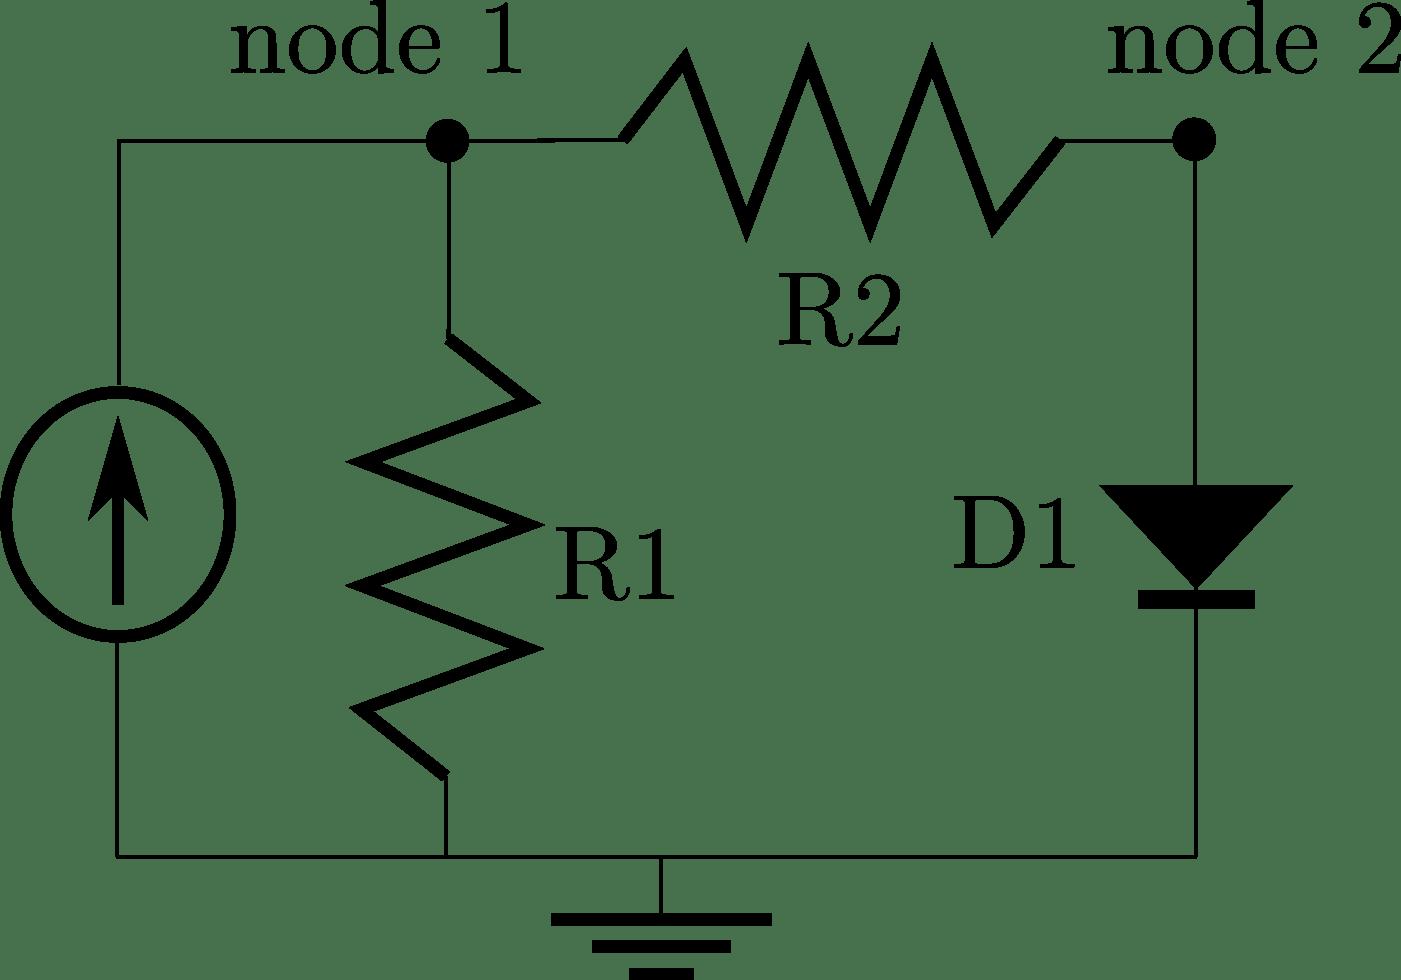 Converging An Implicit Model Nonlinear Circuitysis